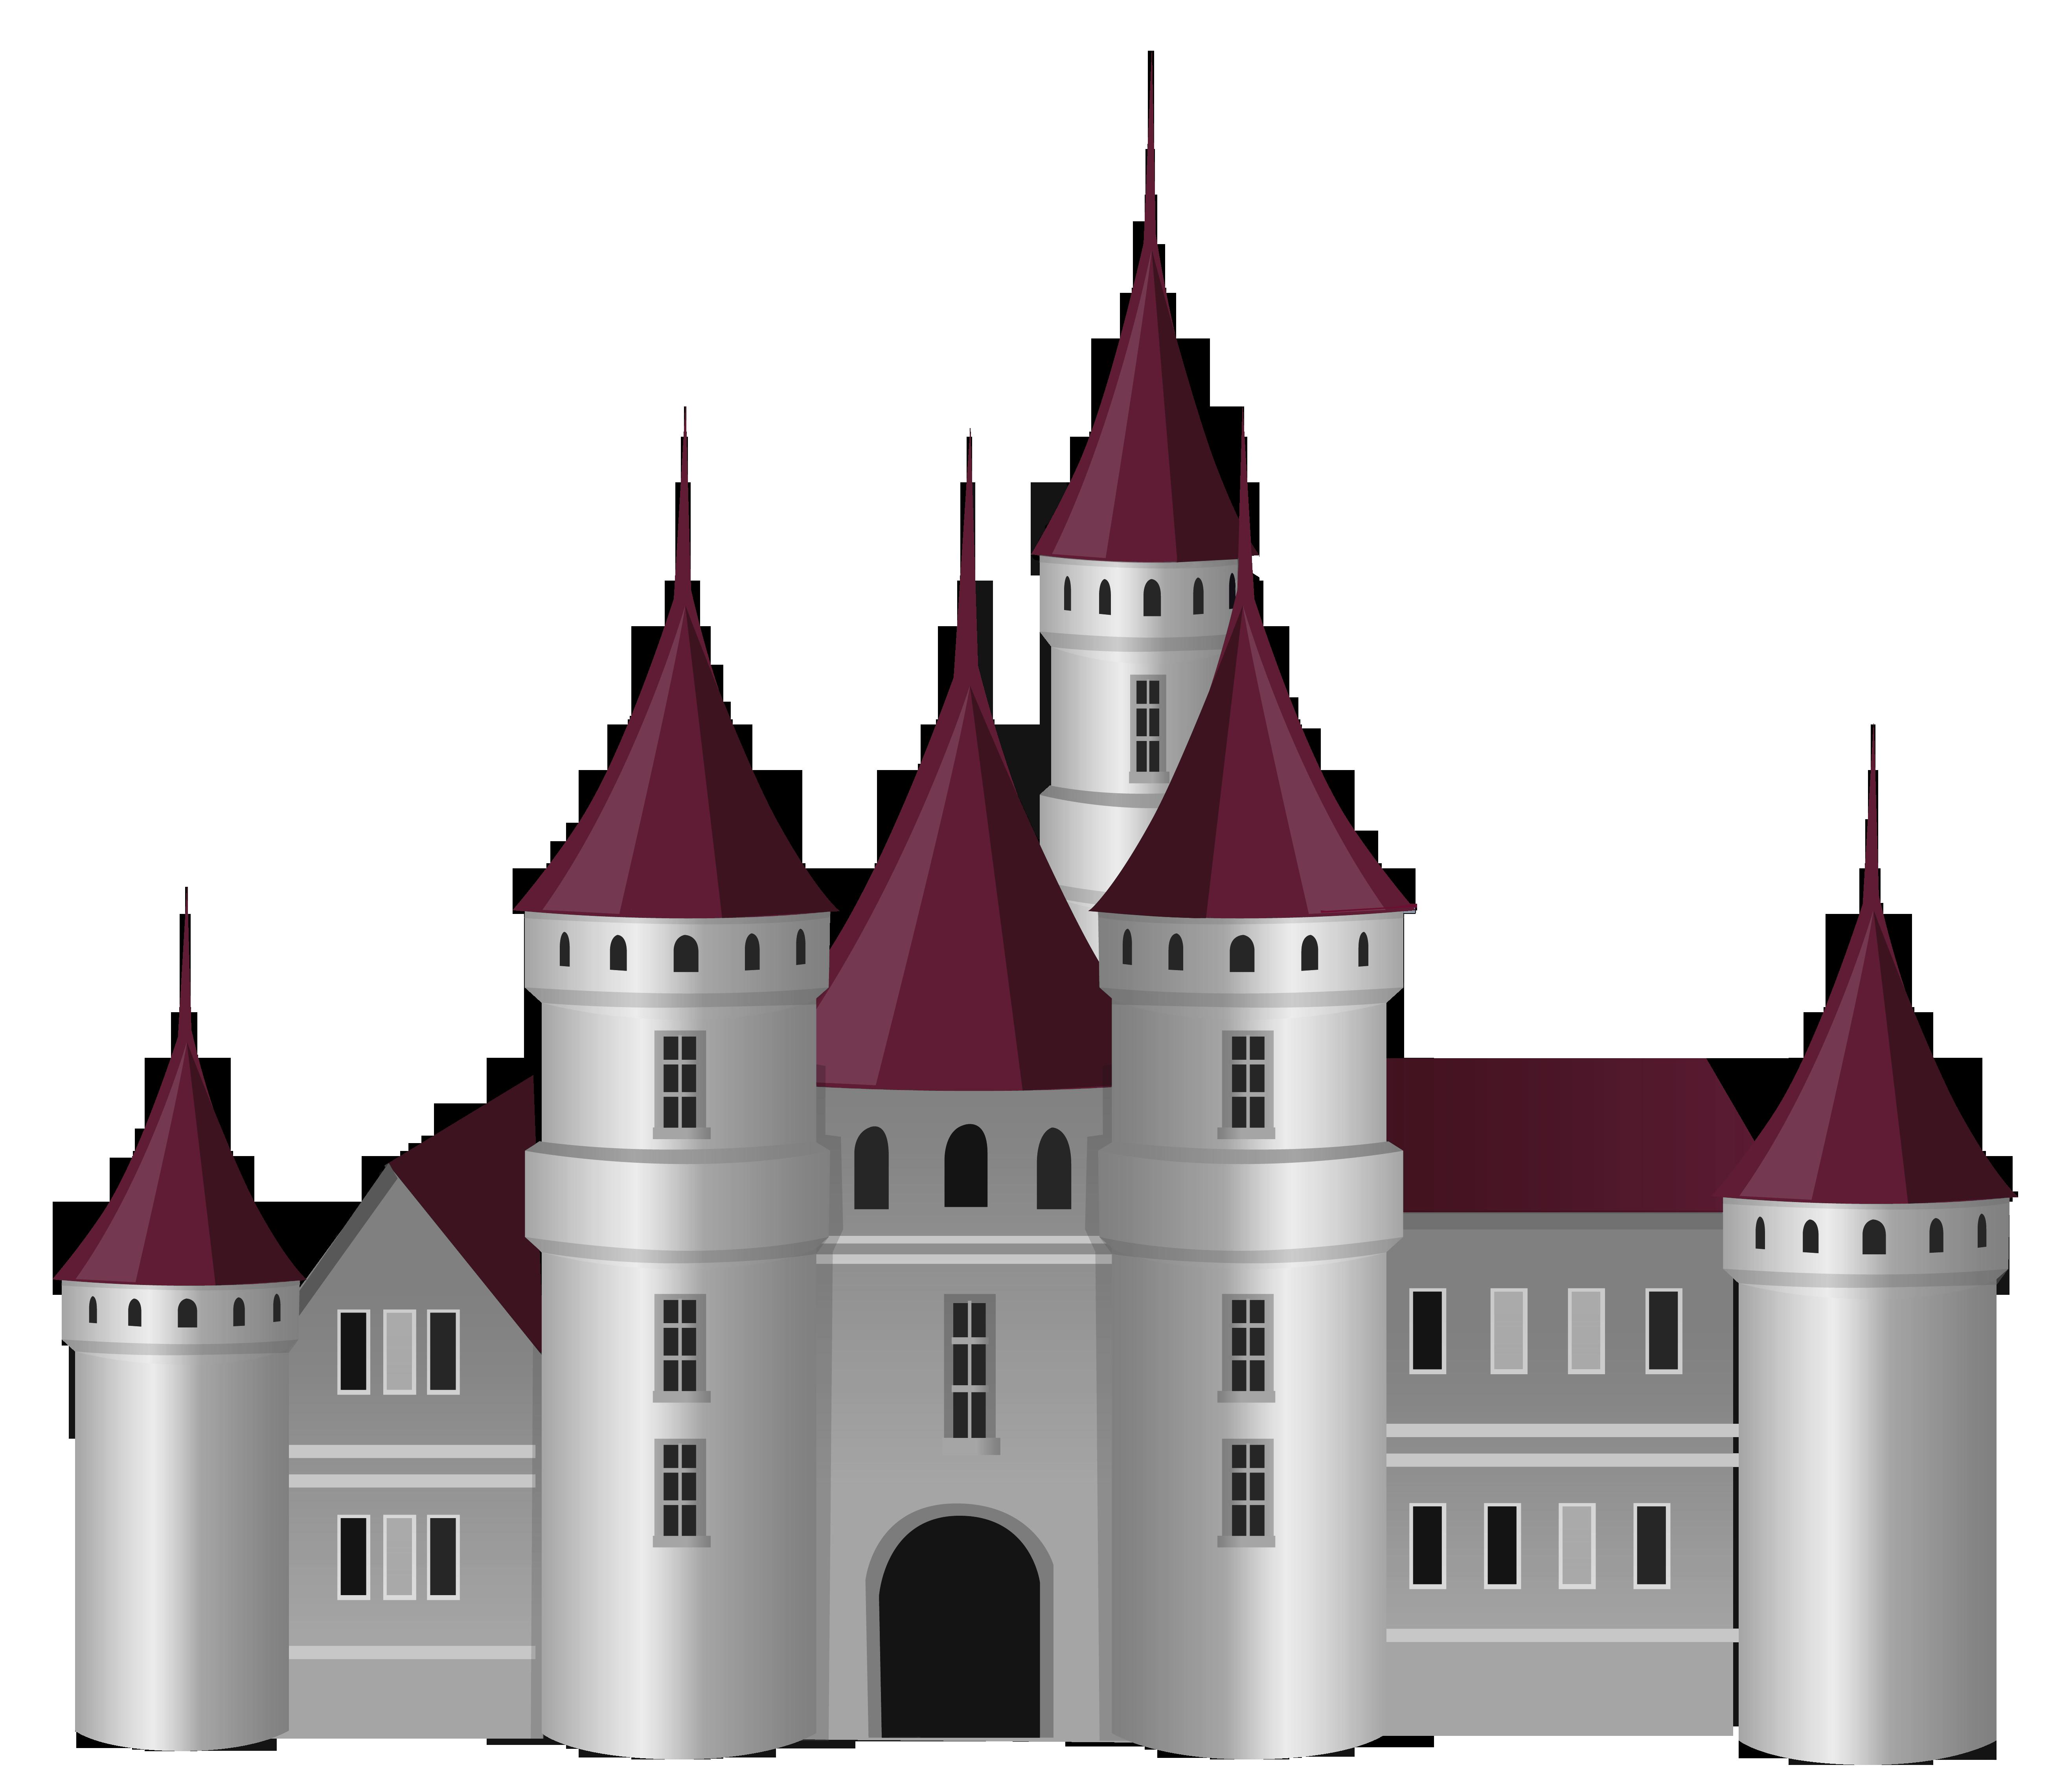 new castles cartoon. Palace clipart fish tank